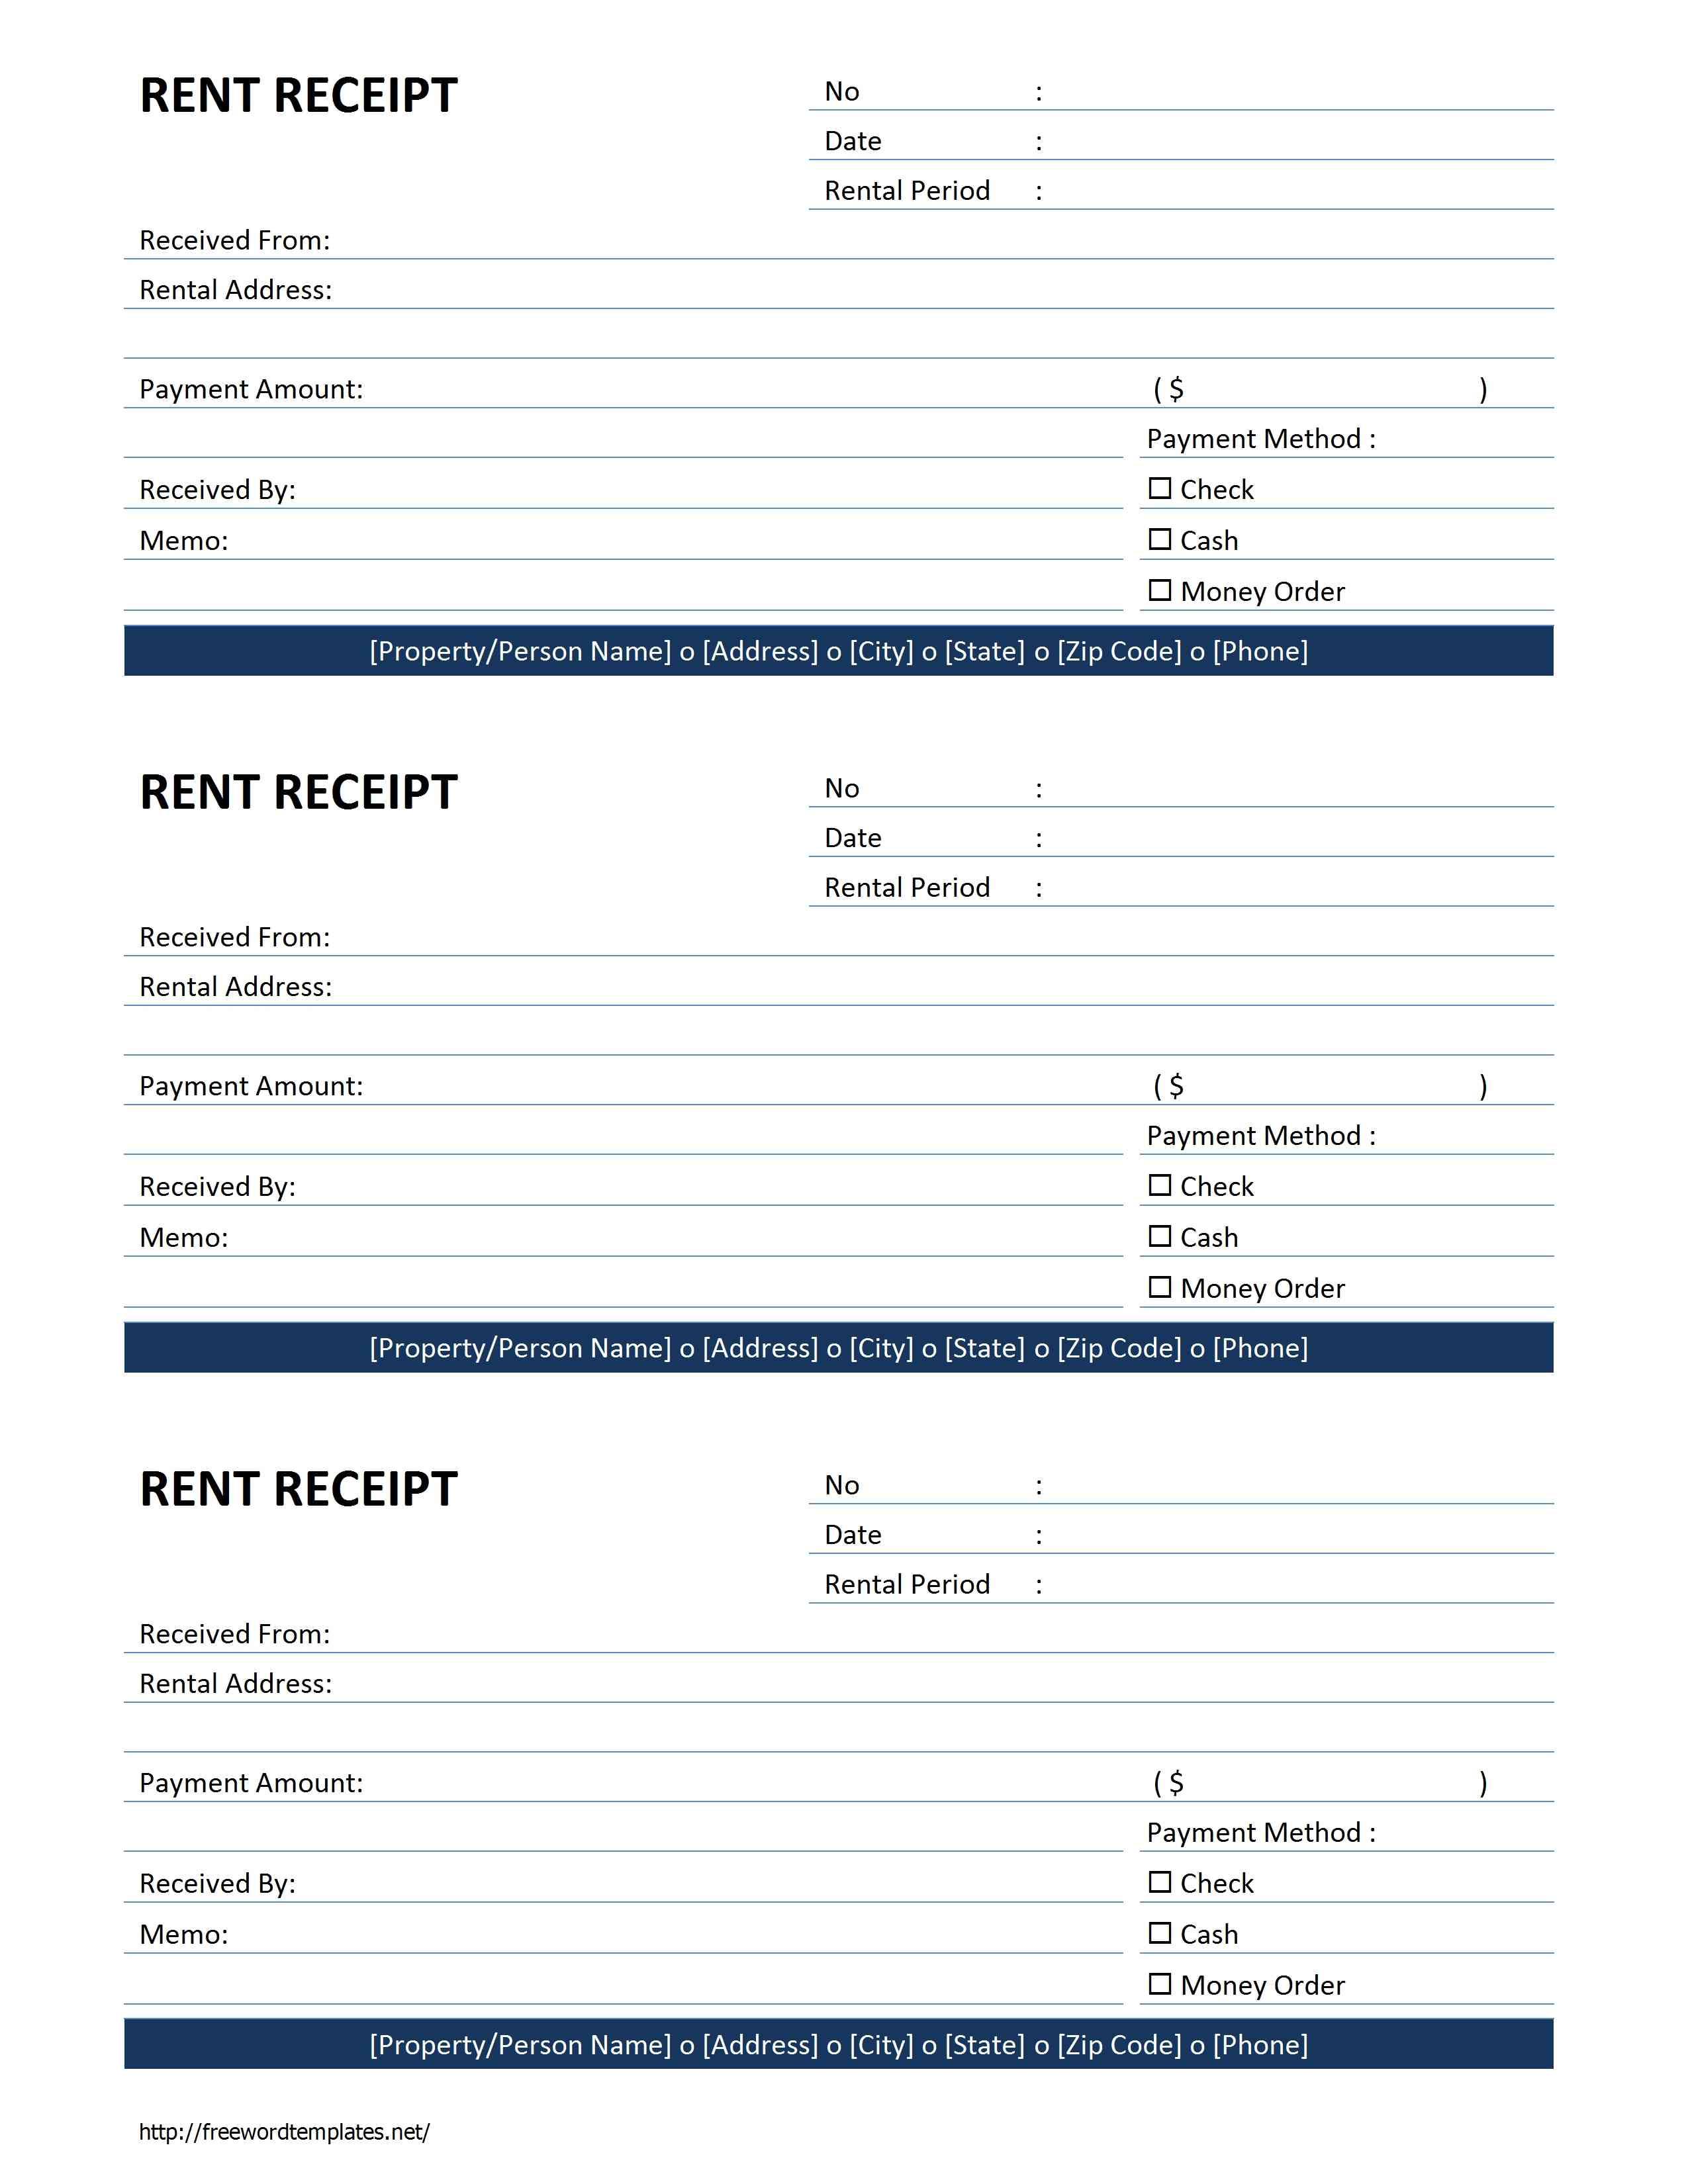 152-Rent-Receipt